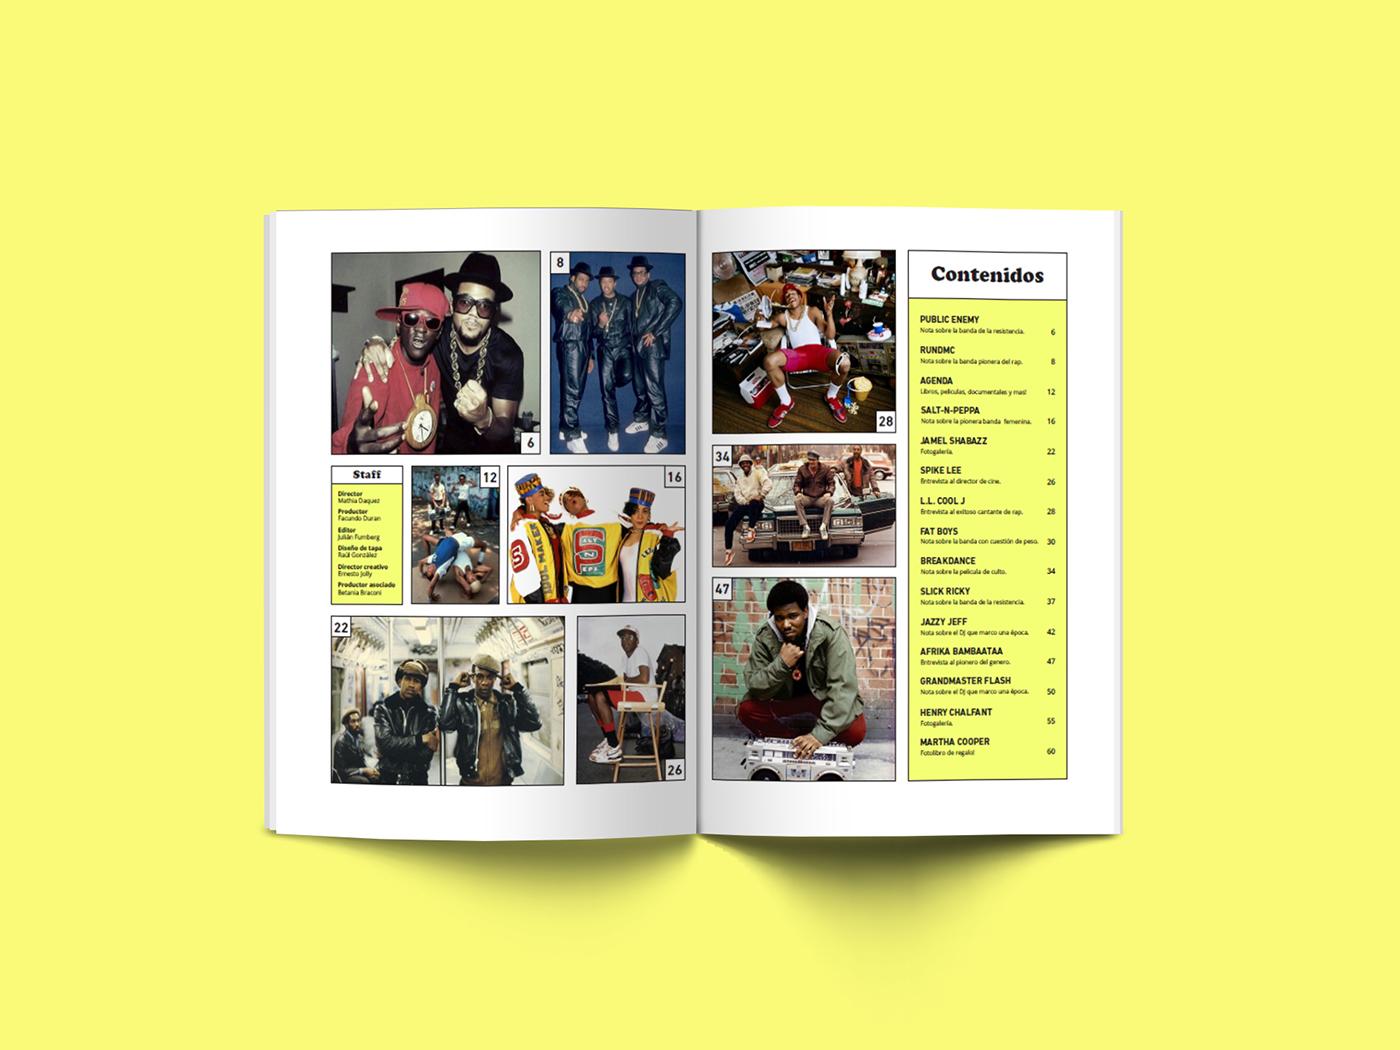 hip hop rap old school magazine run dmc editorial cosgaya